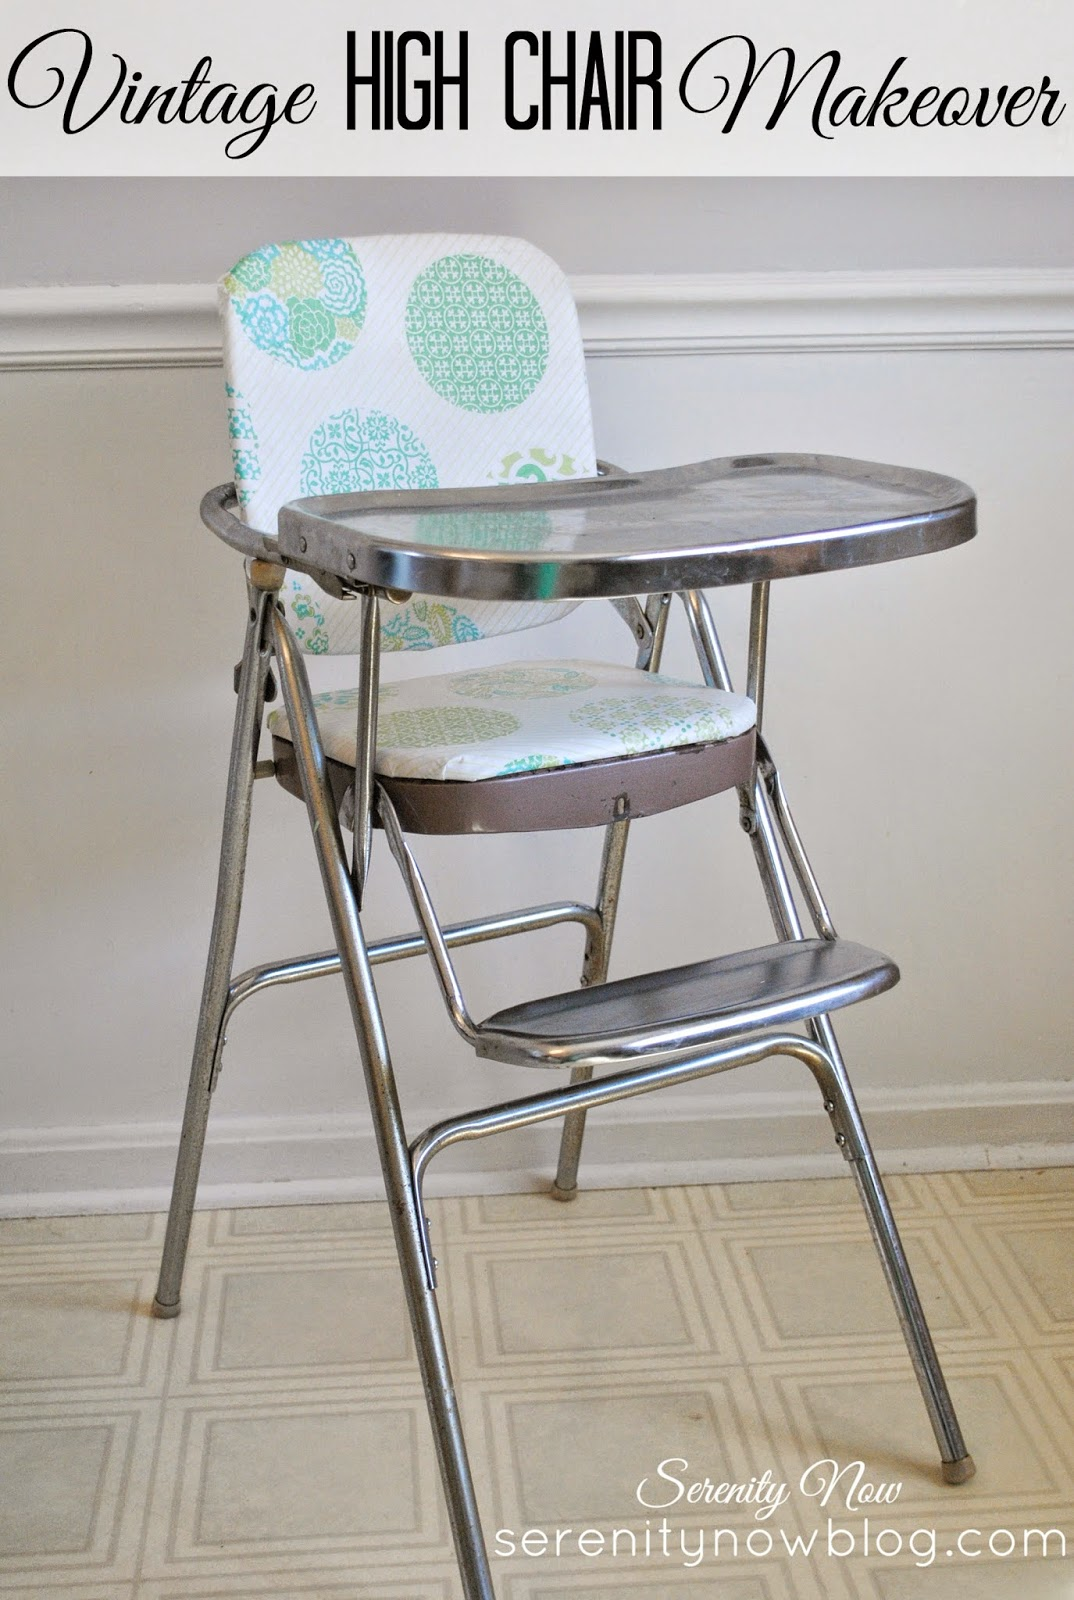 Astonishing Serenity Now Vintage Stainless Steel High Chair Makeover Inzonedesignstudio Interior Chair Design Inzonedesignstudiocom